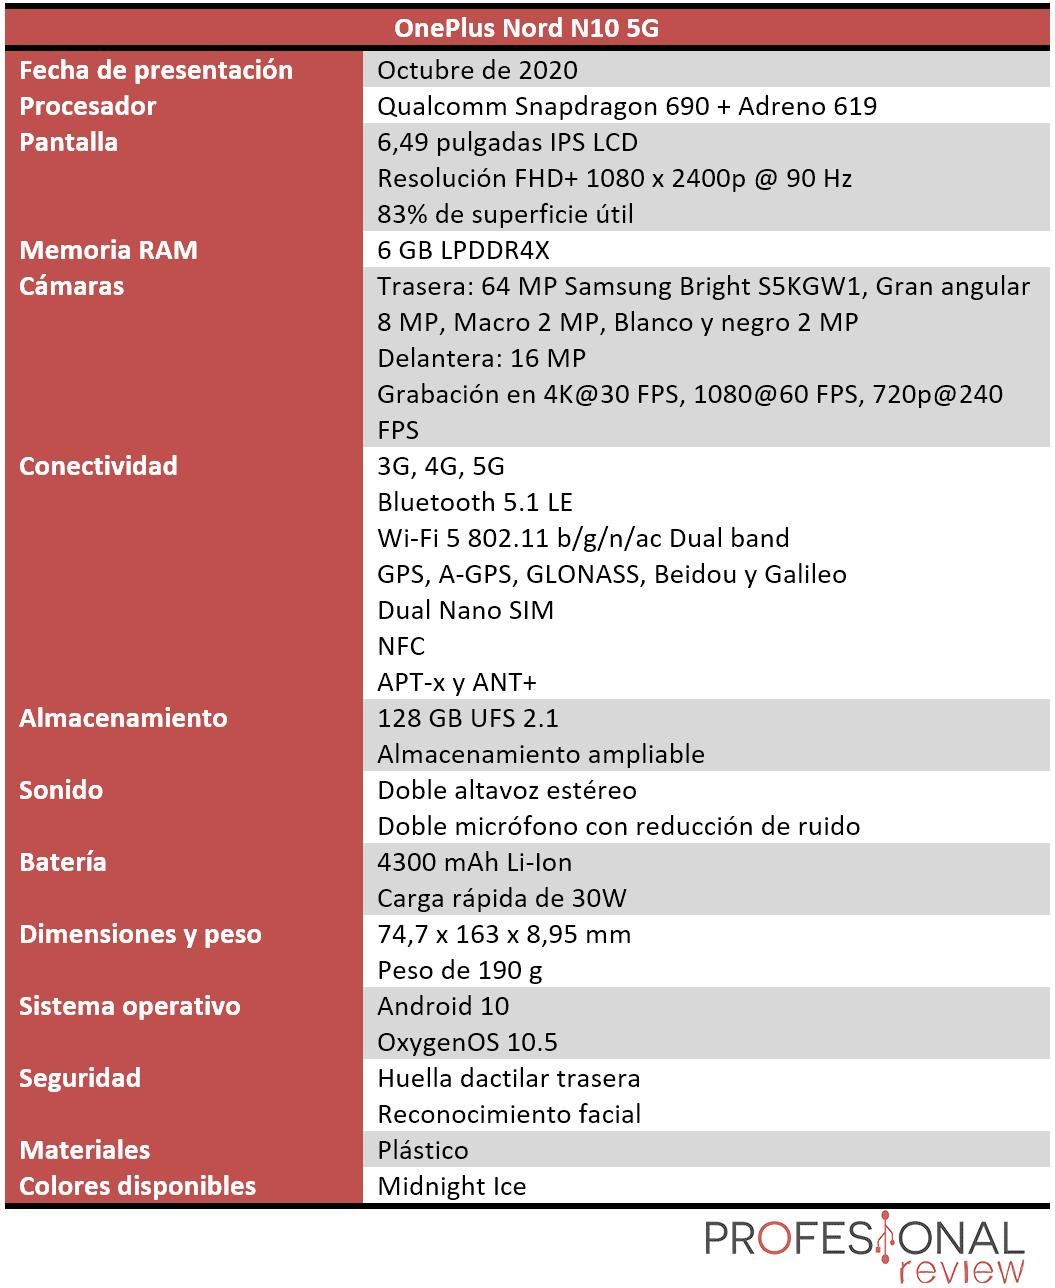 OnePlus Nord N10 5G Características